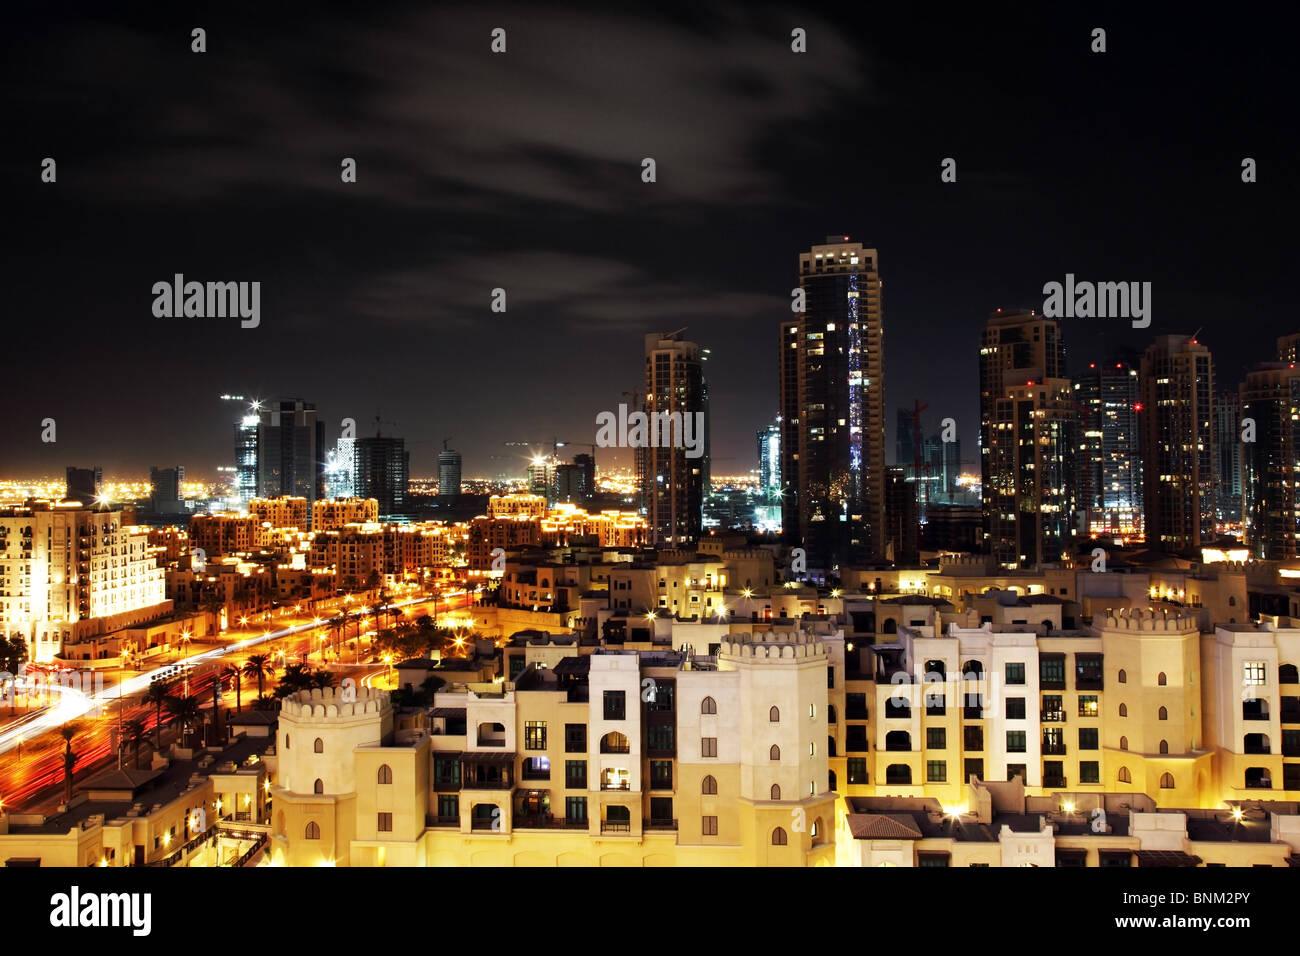 Dubai downtown at night - Stock Image